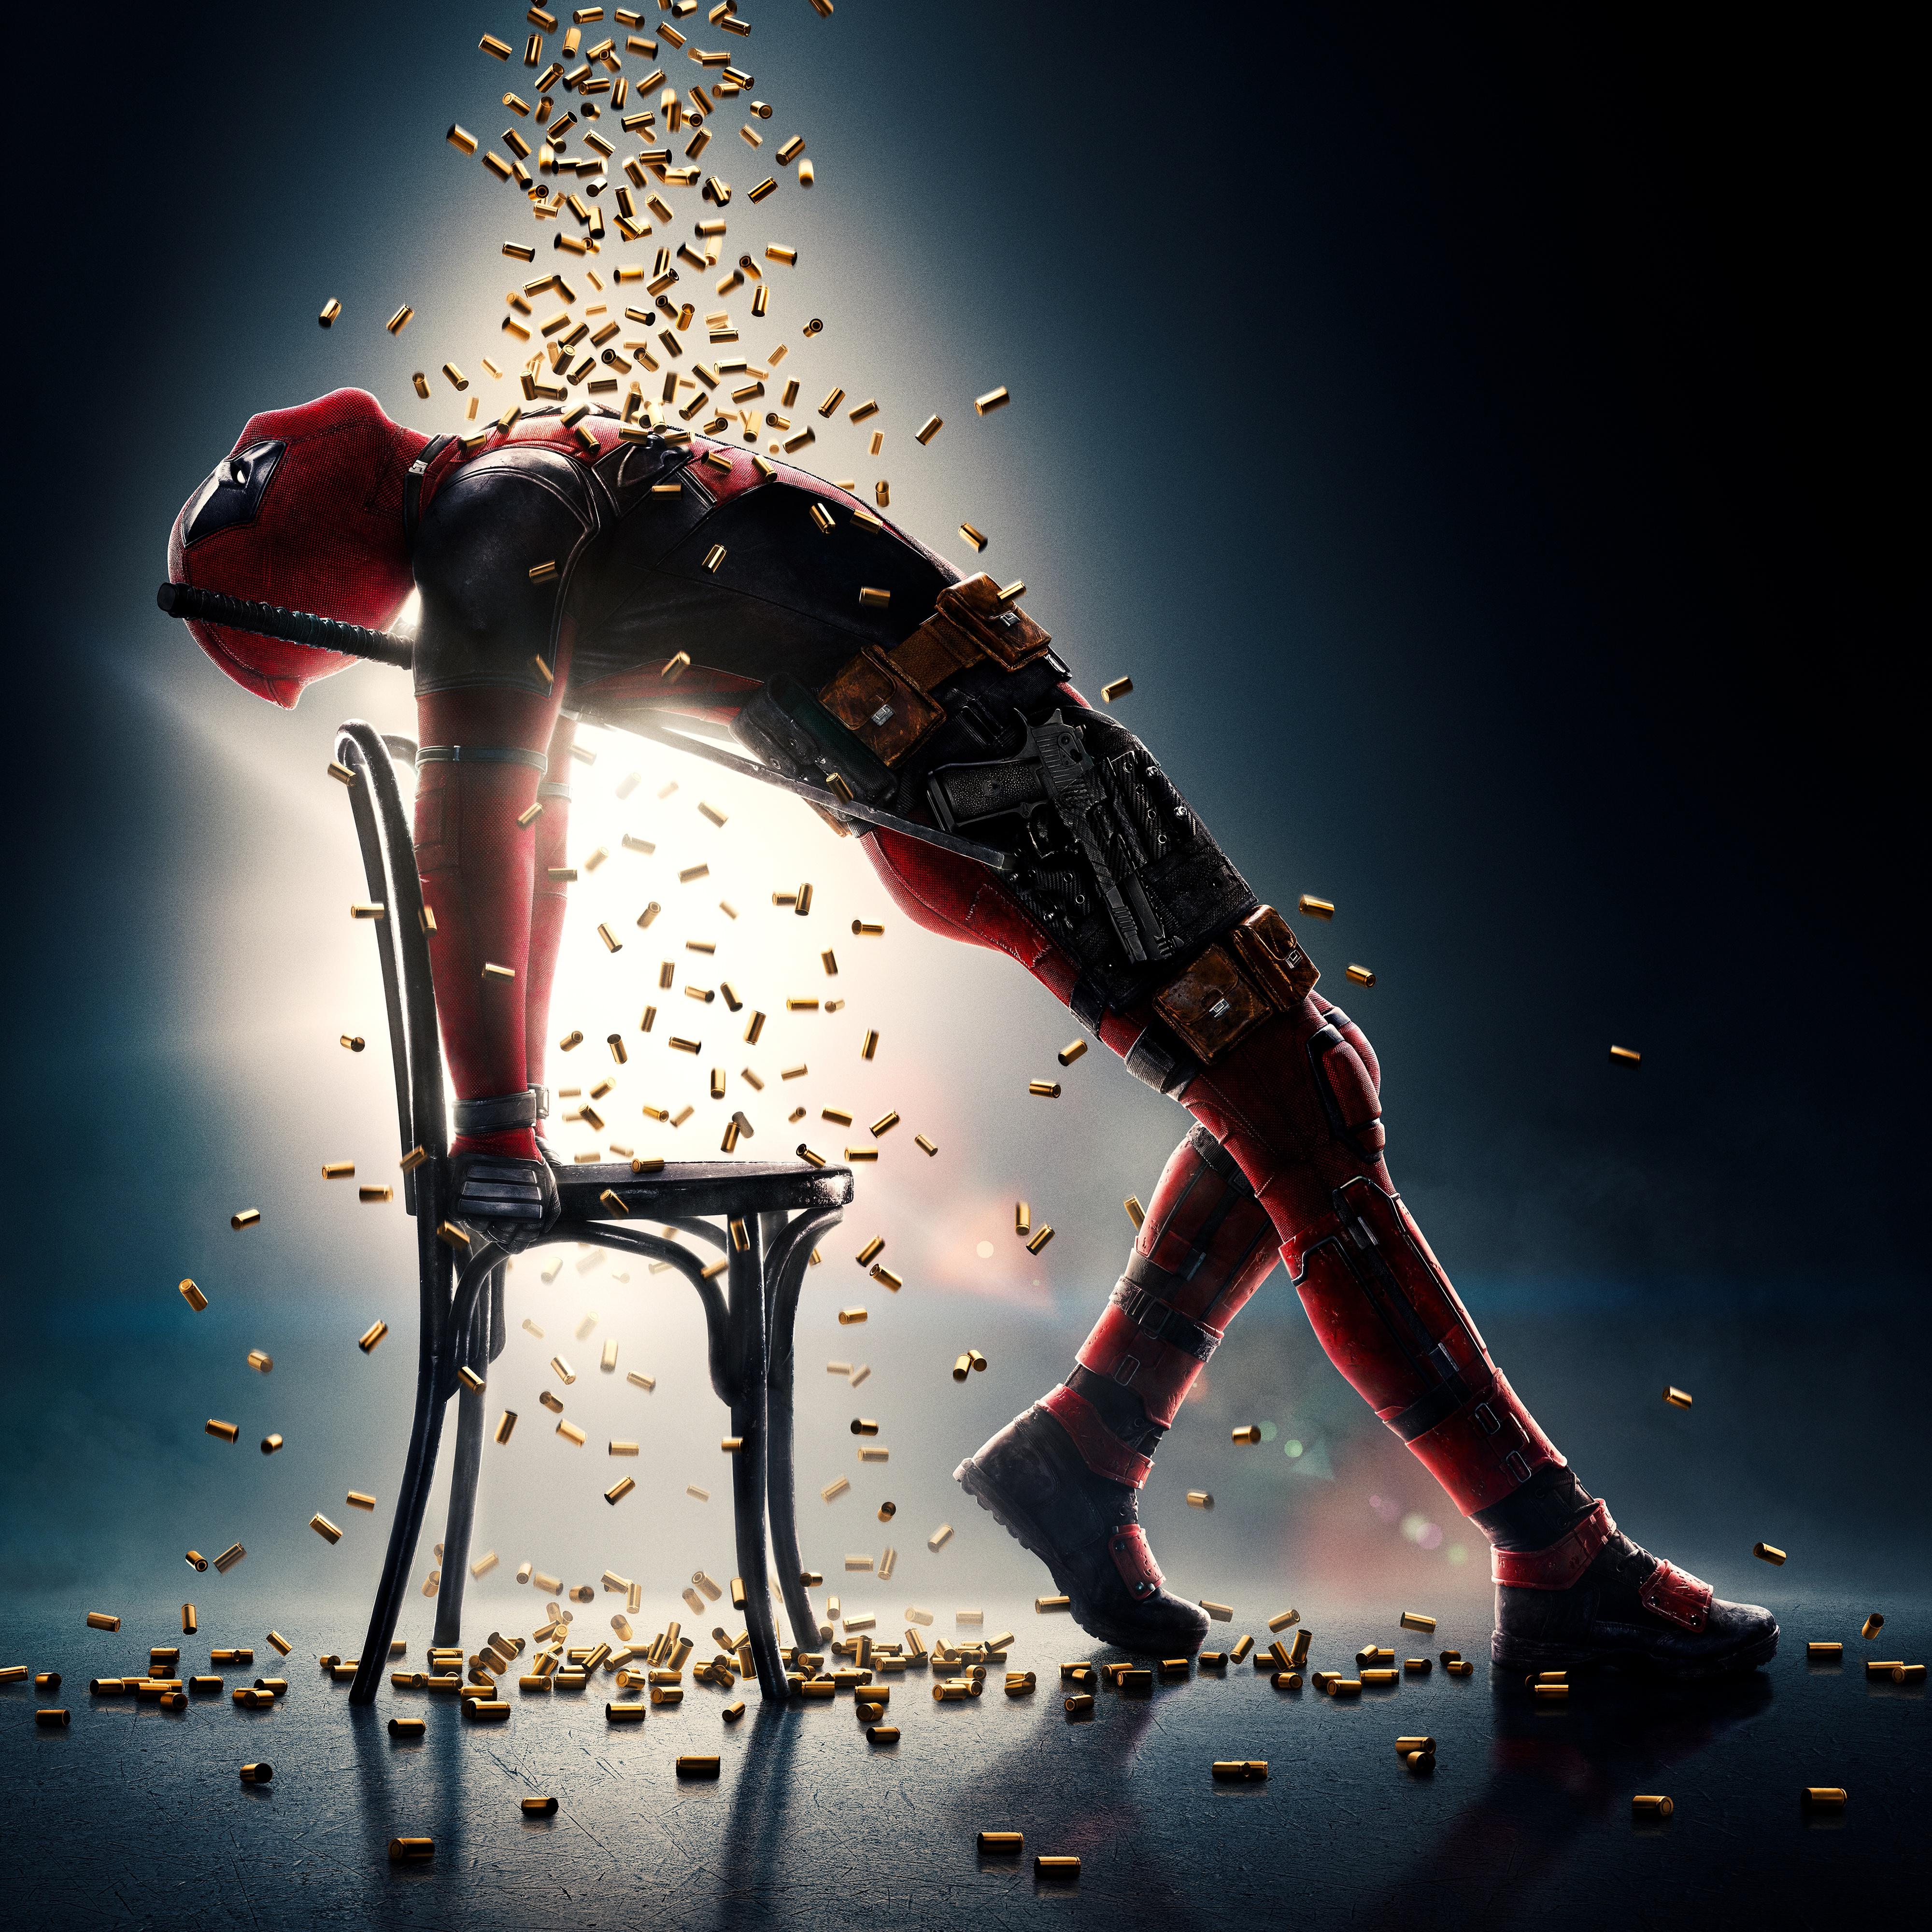 Wallpaper Deadpool 2 Shell Casing Marvel Cinematic Universe